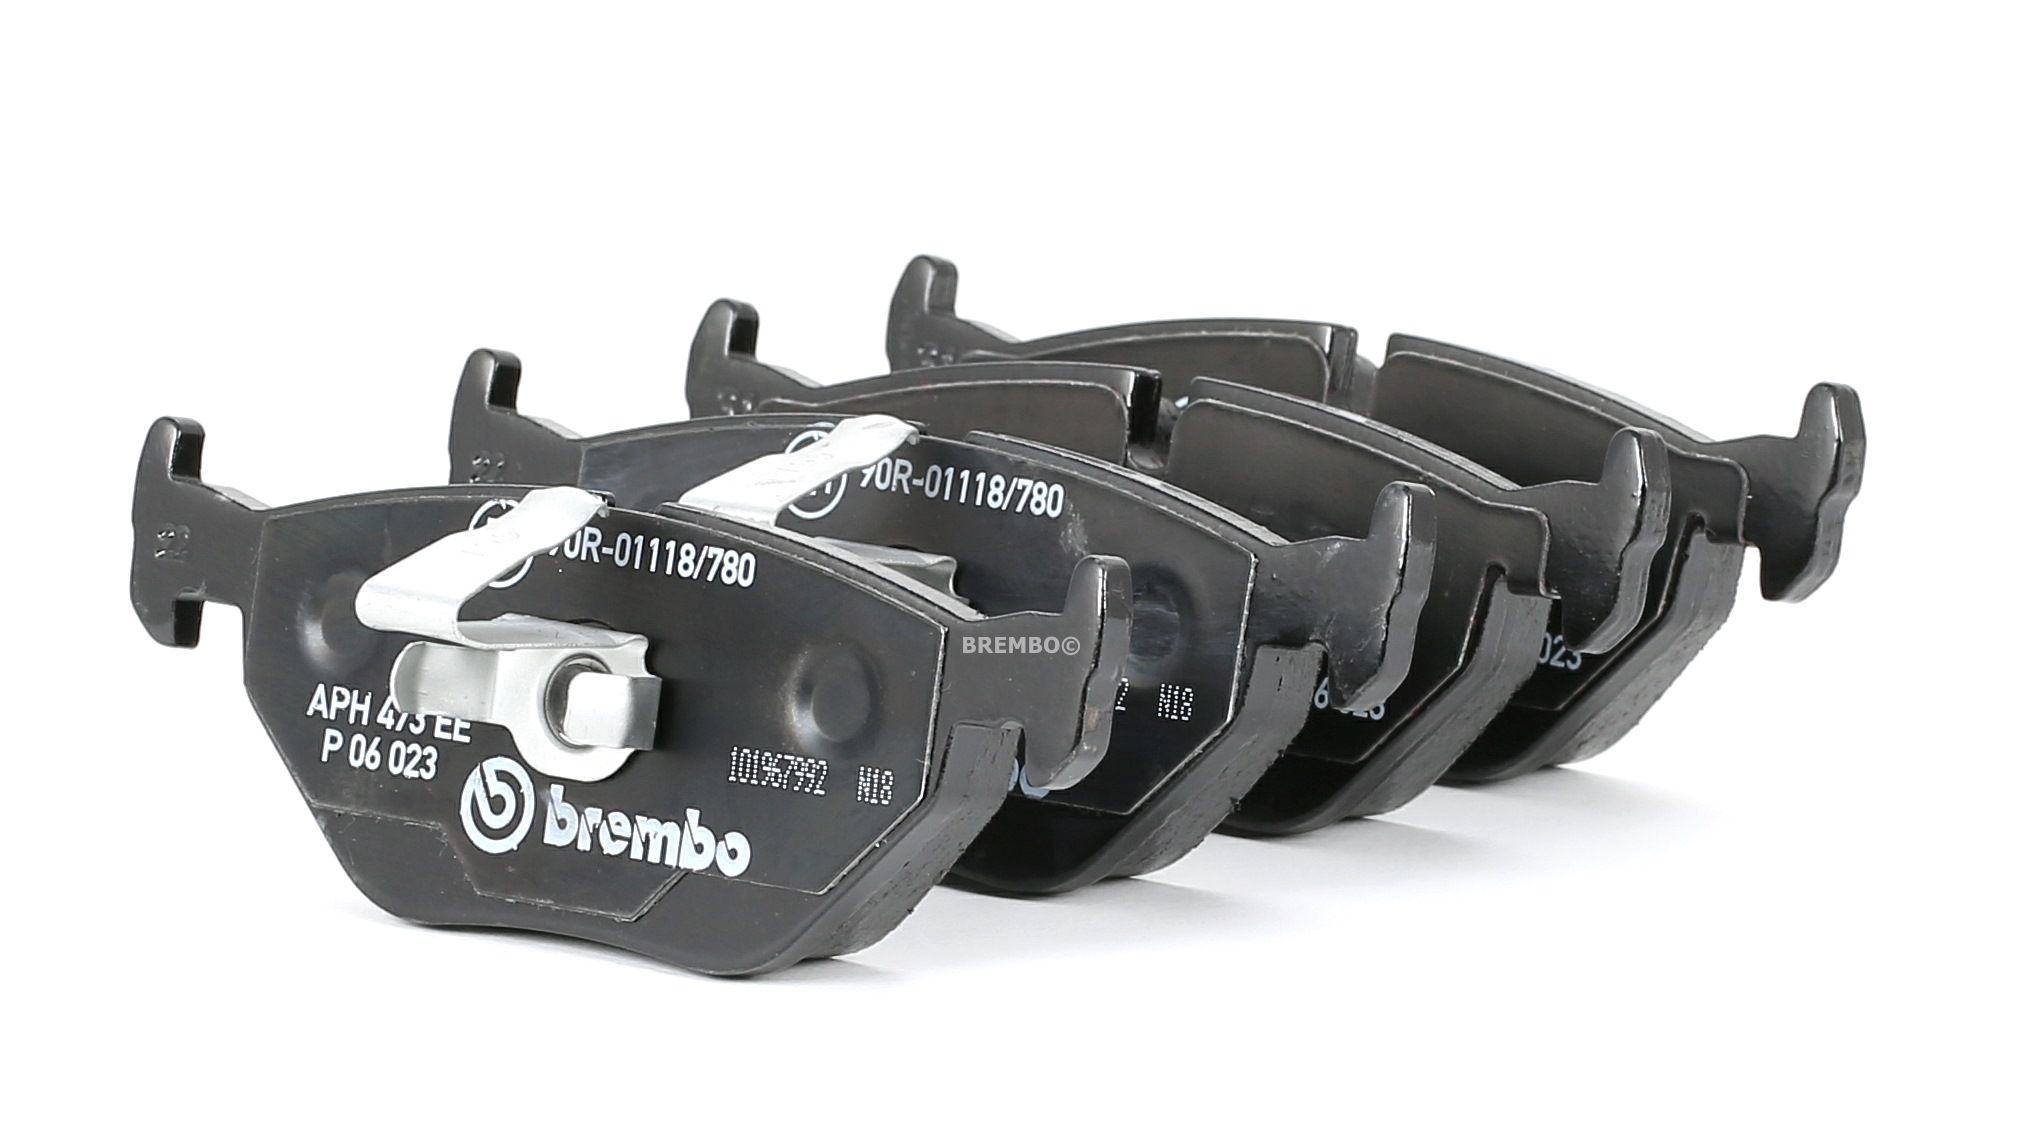 Bremsbelagsatz BREMBO D3967449 Bewertung